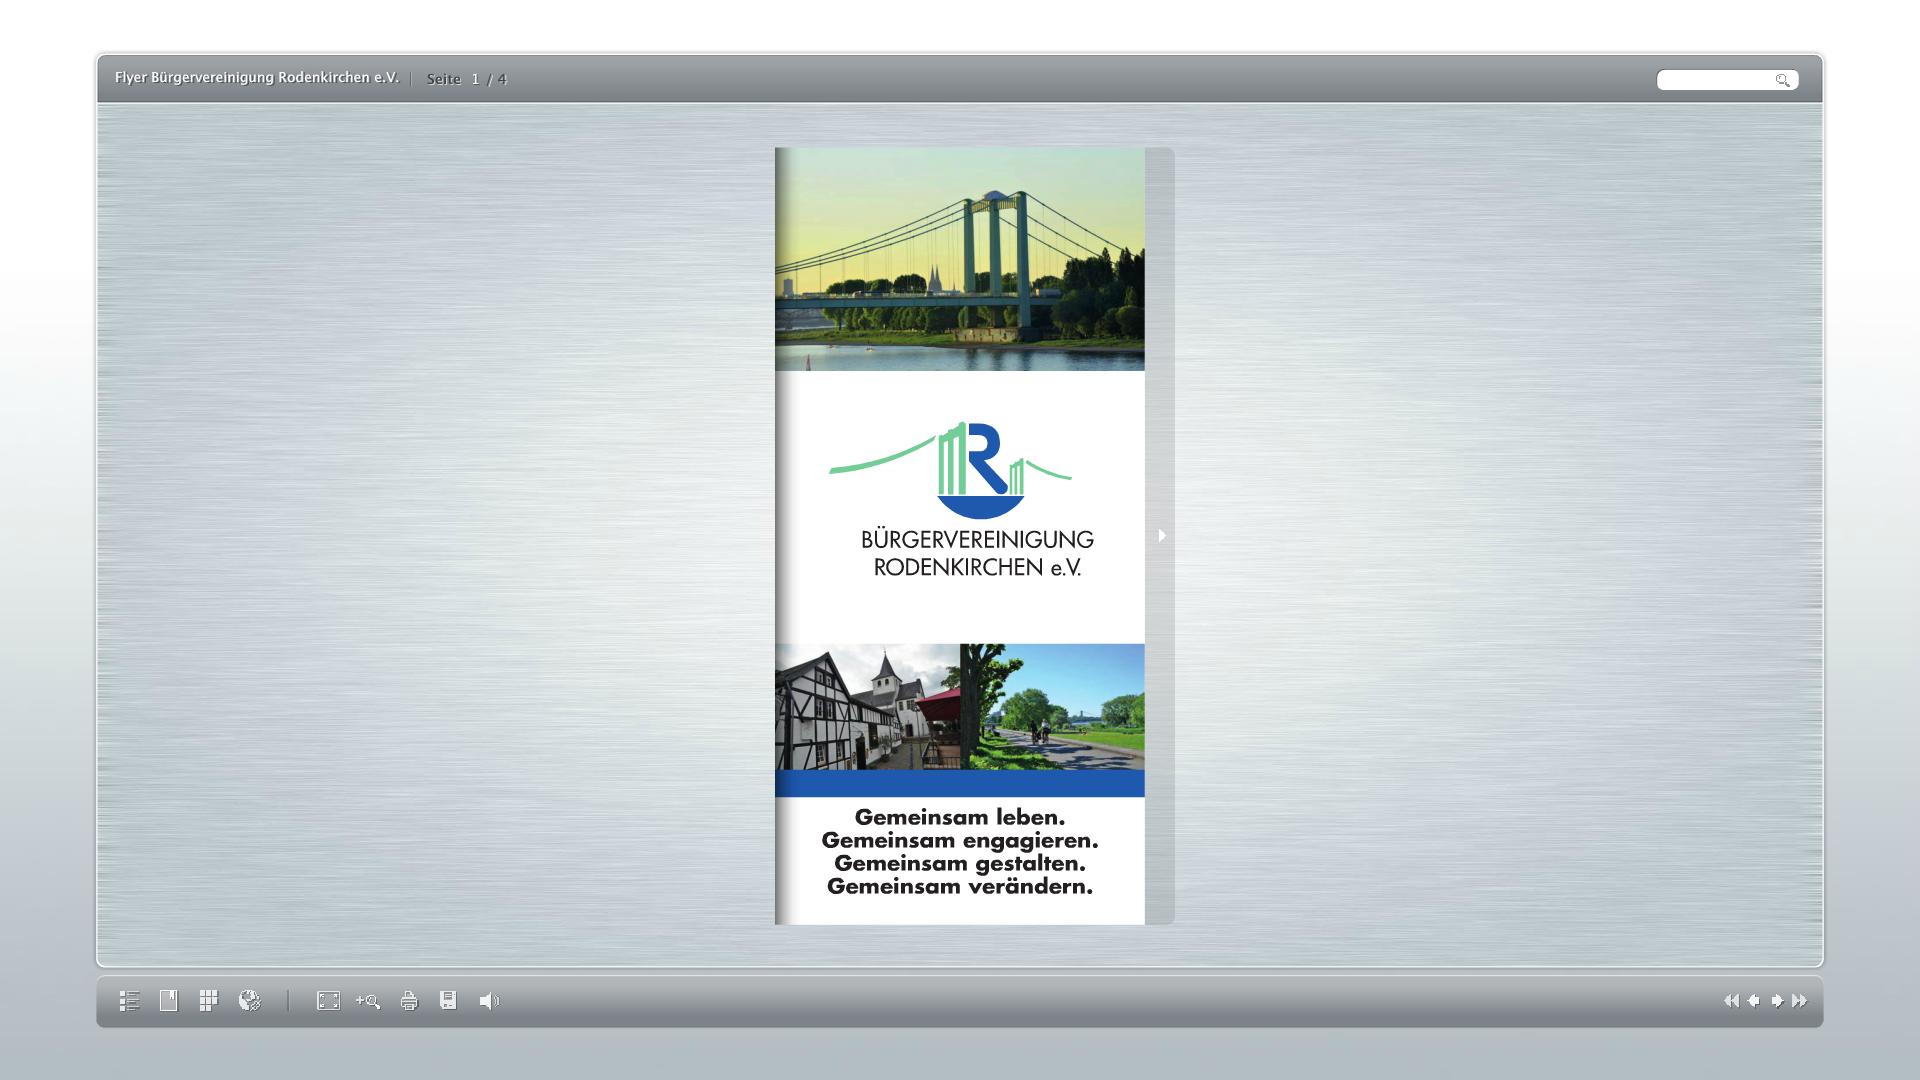 Flyer der Bürgervereinigung Rodenkirchen